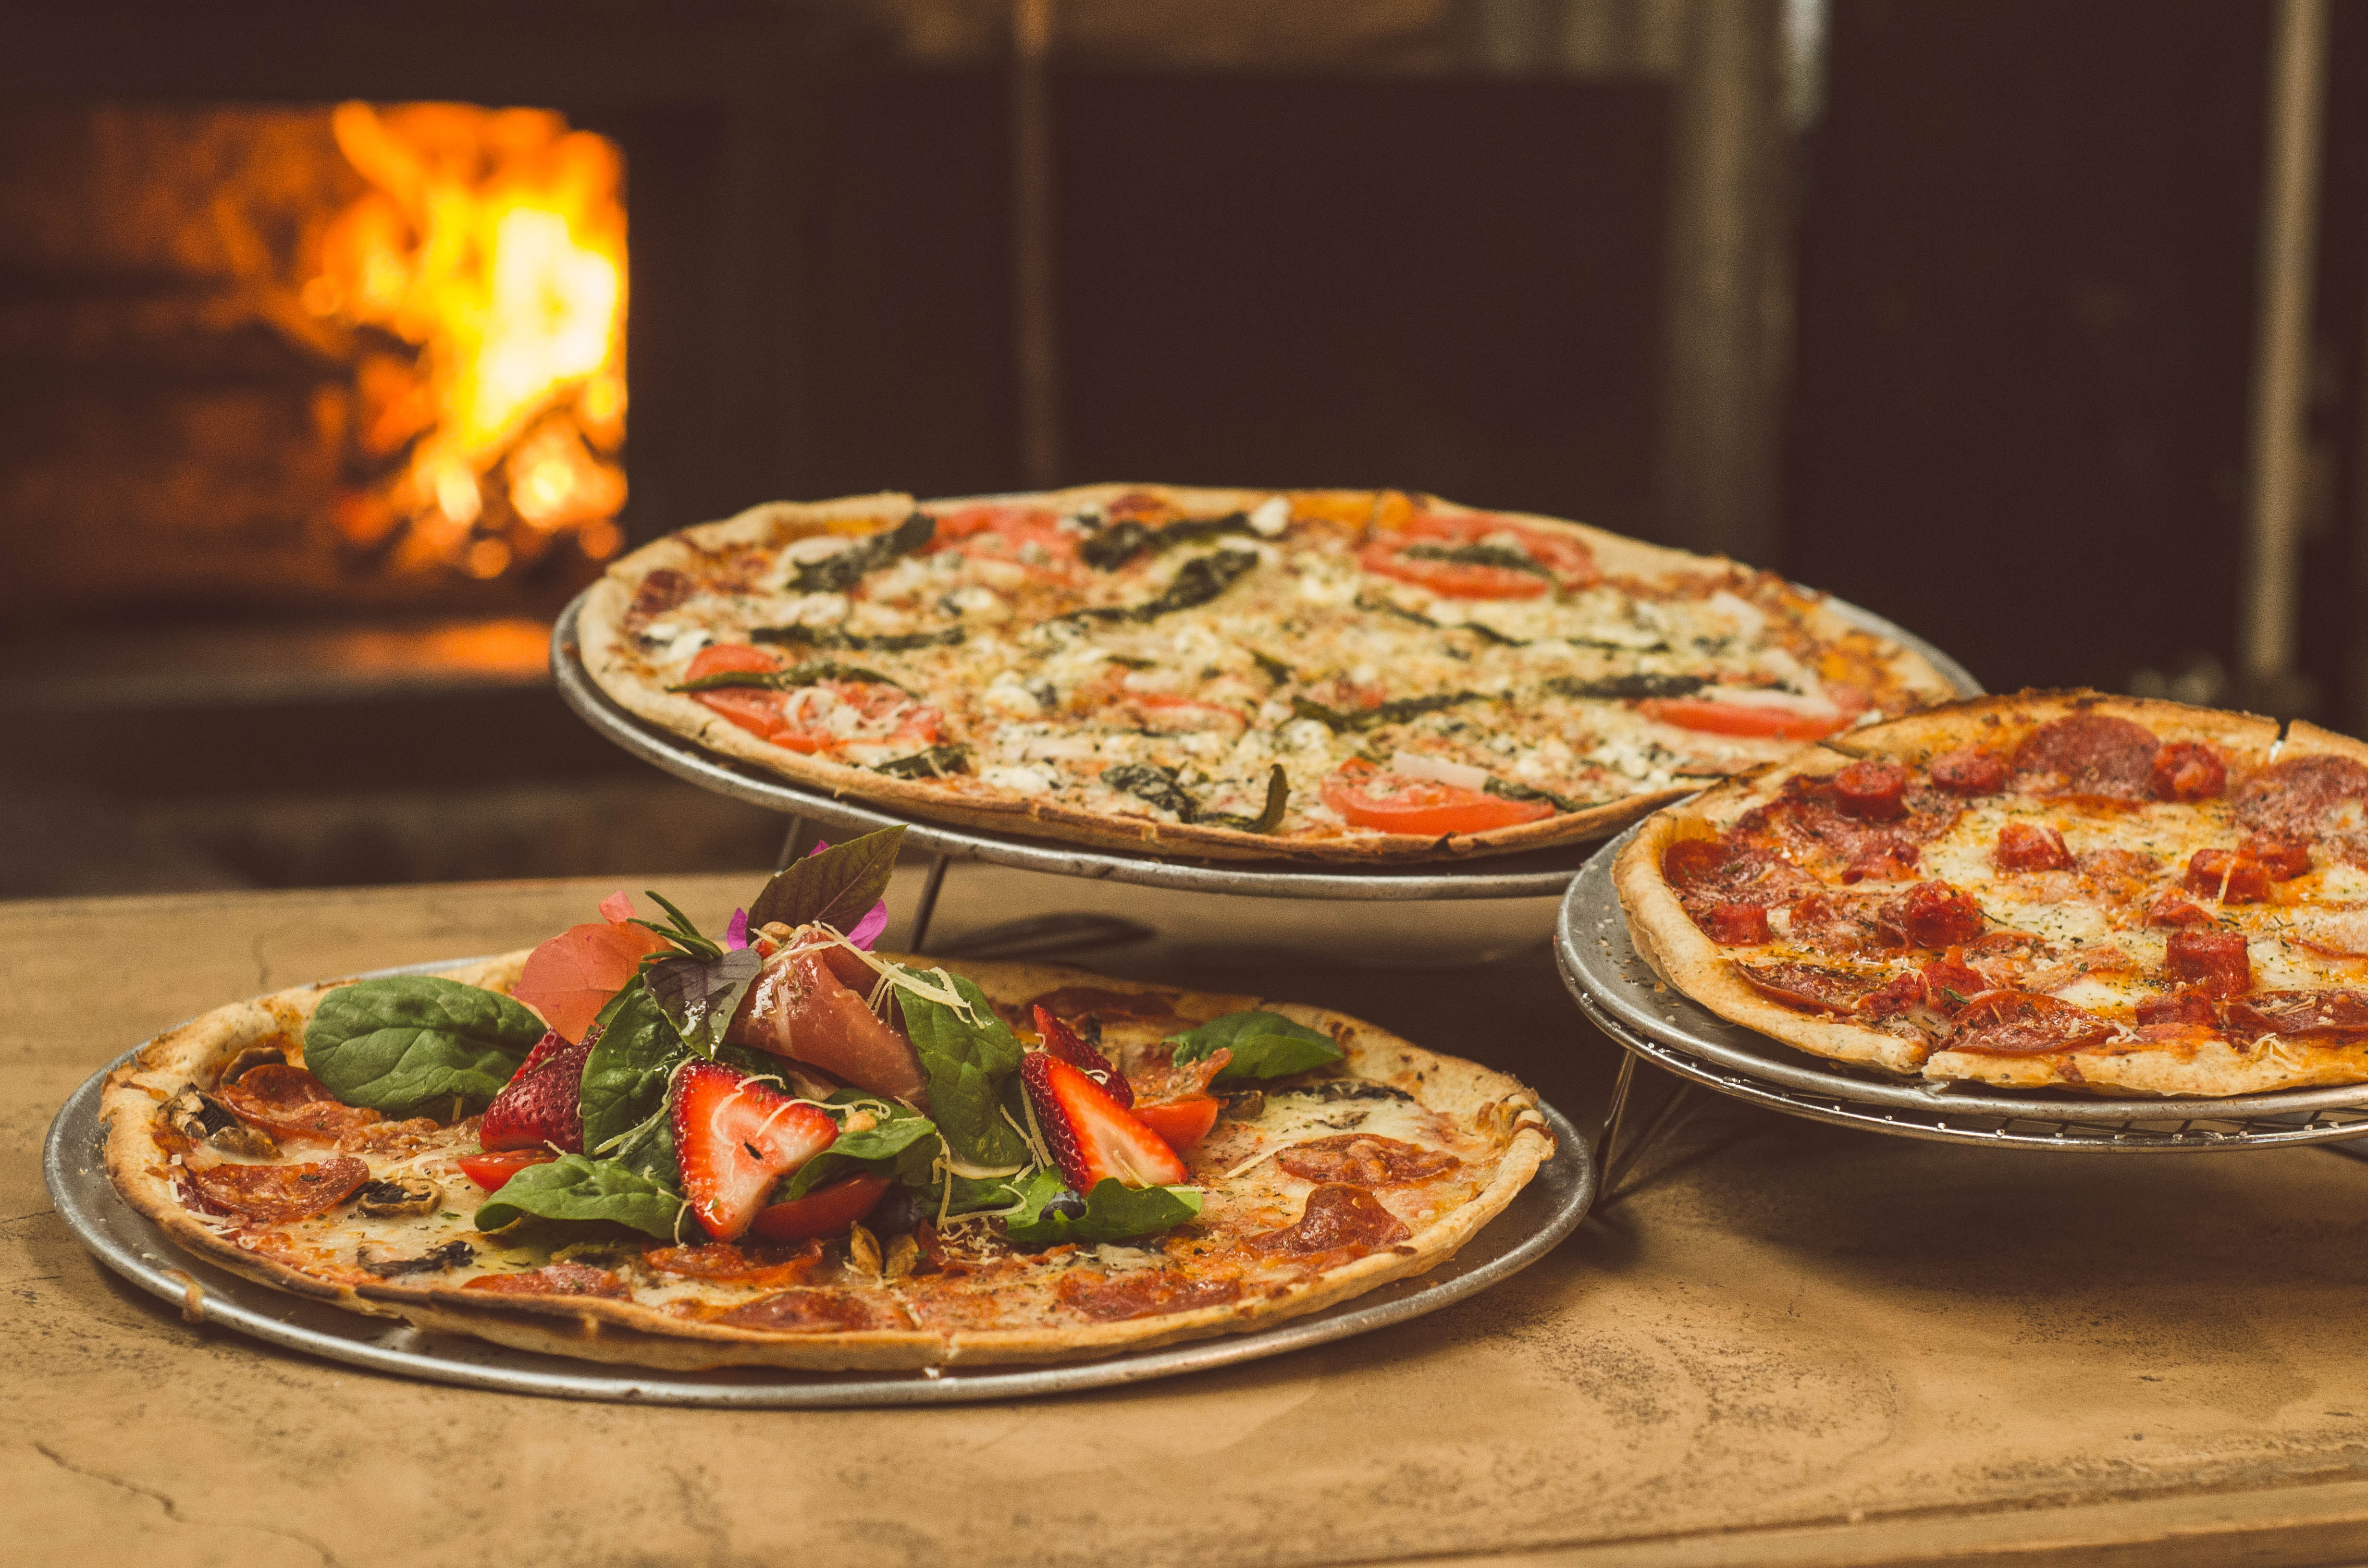 50 Great Pizza Photos Pexels Free Stock